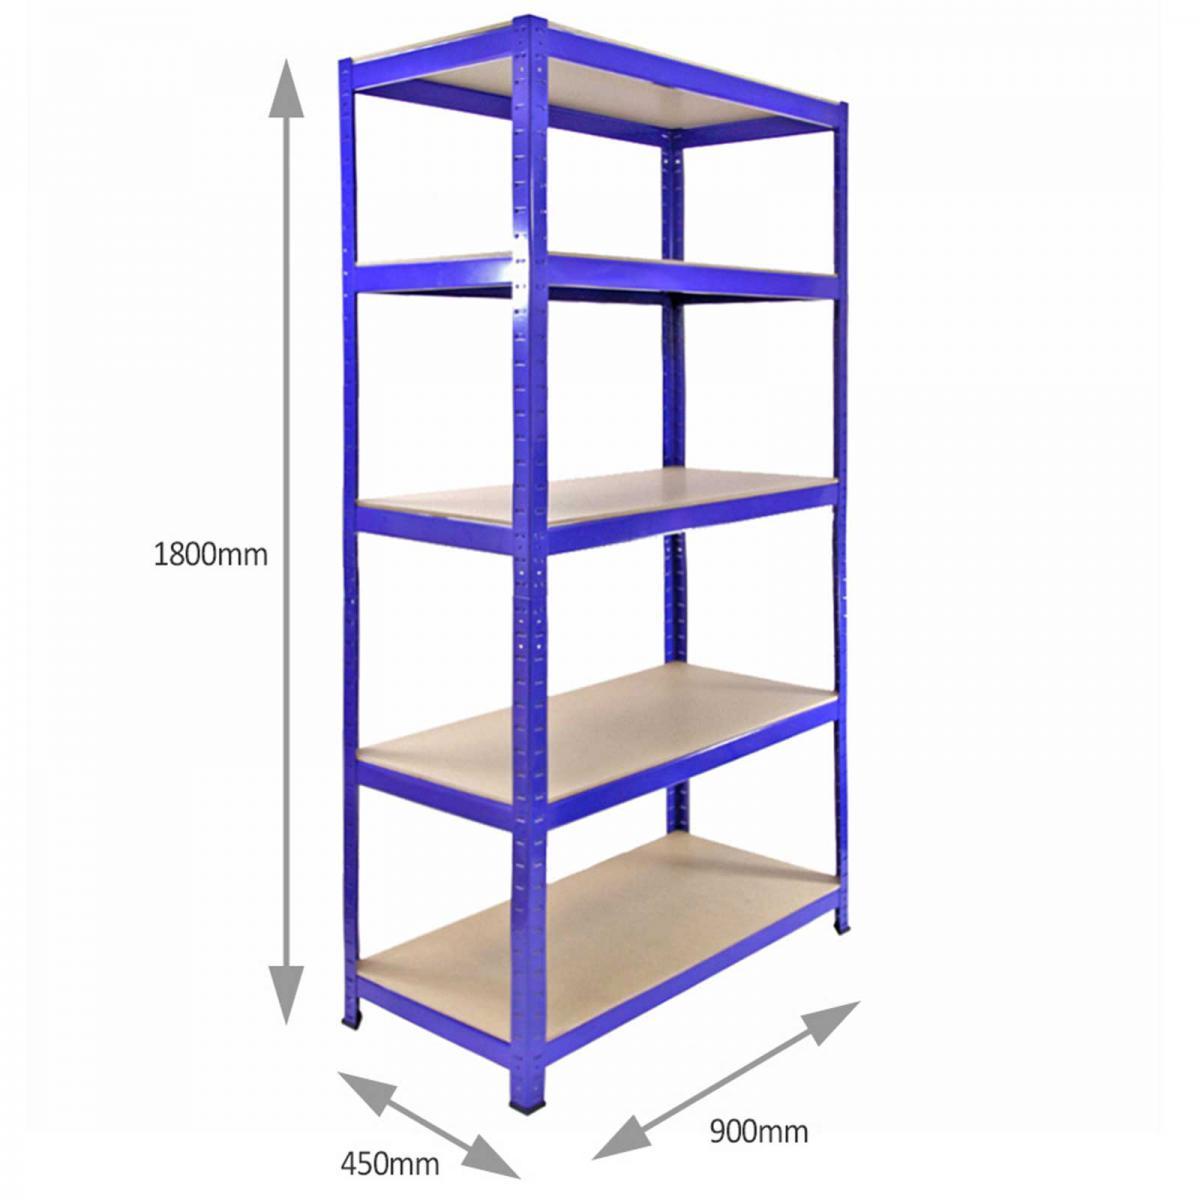 4 garage shelving units storage heavy duty metal racking. Black Bedroom Furniture Sets. Home Design Ideas